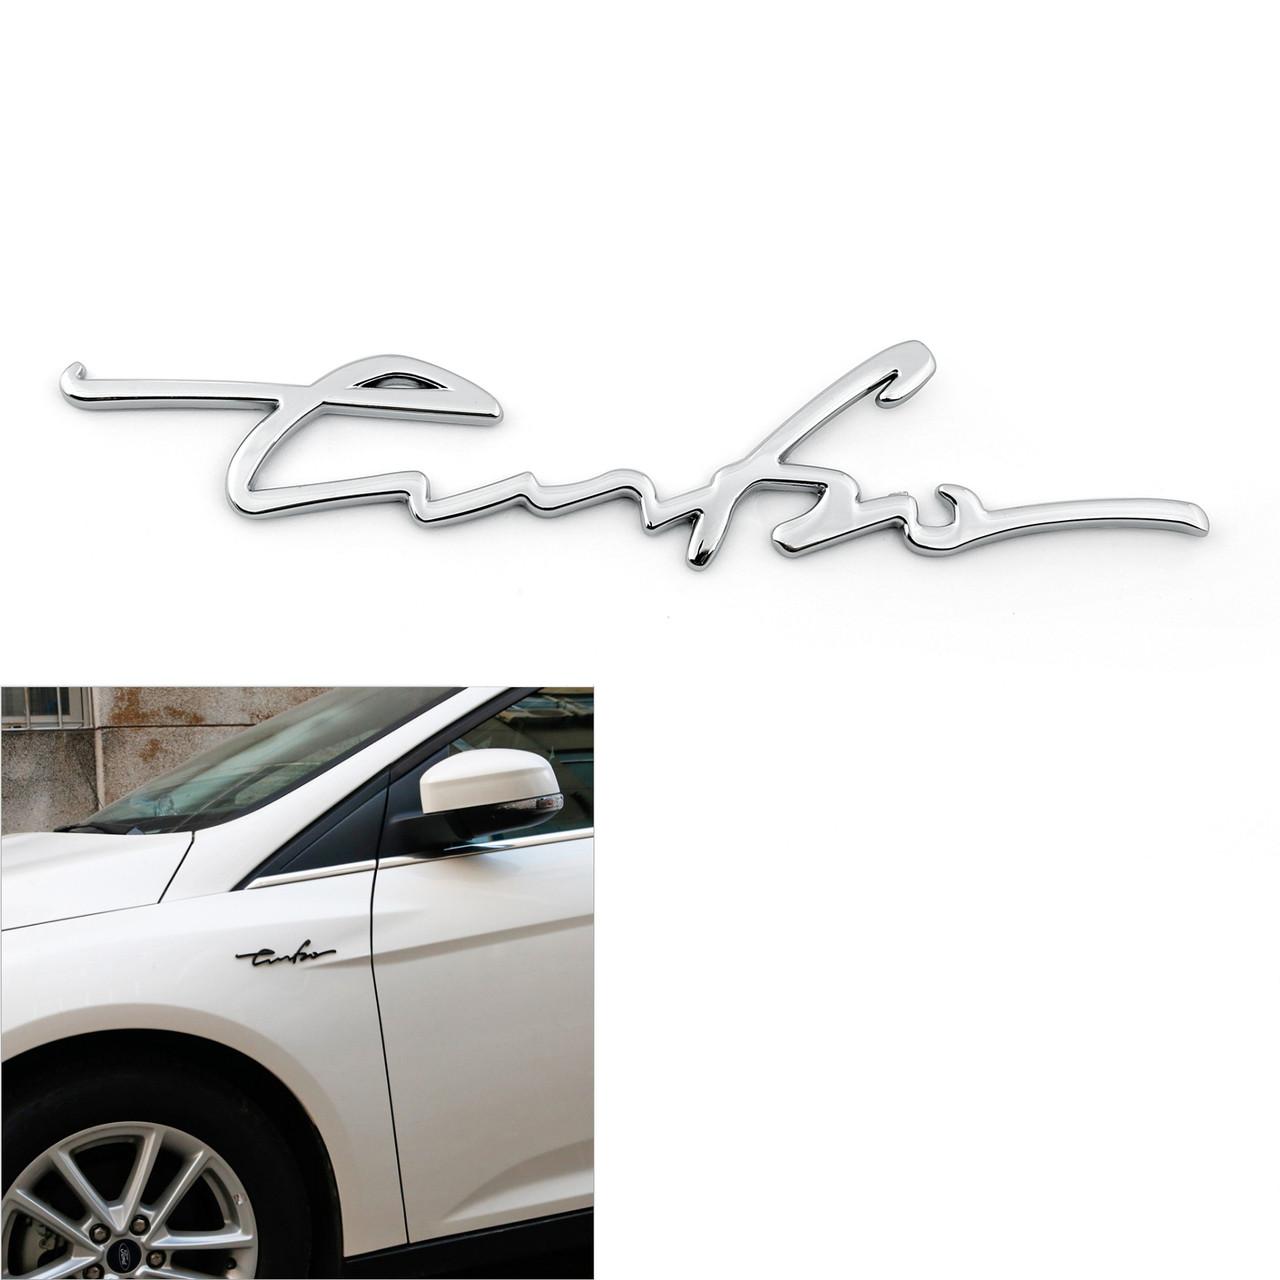 Radiator Coolant Hose Flange-Meyle WD EXPRESS fits 99-05 VW Jetta 2.0L-L4